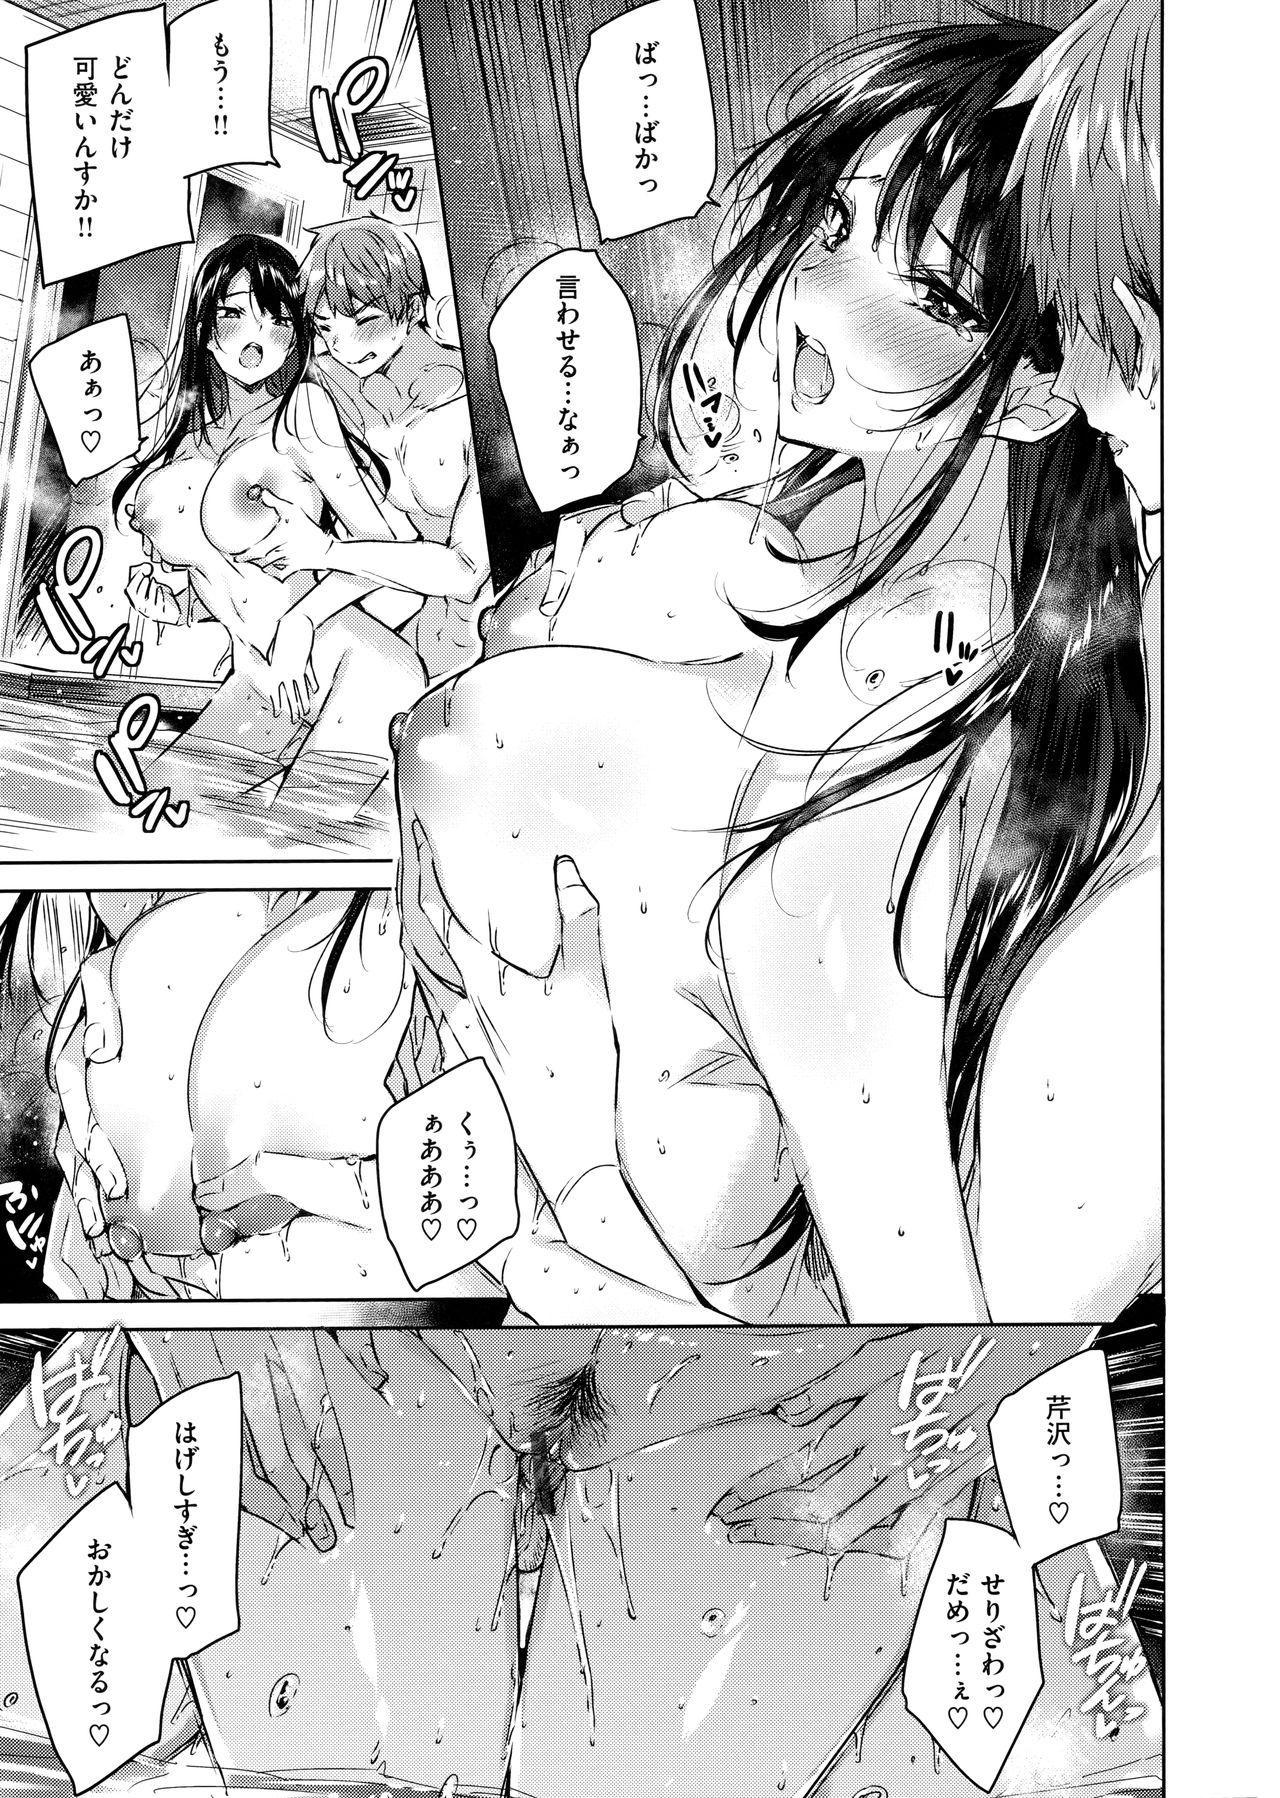 Nakadashi Strike! - Winning strike! 42